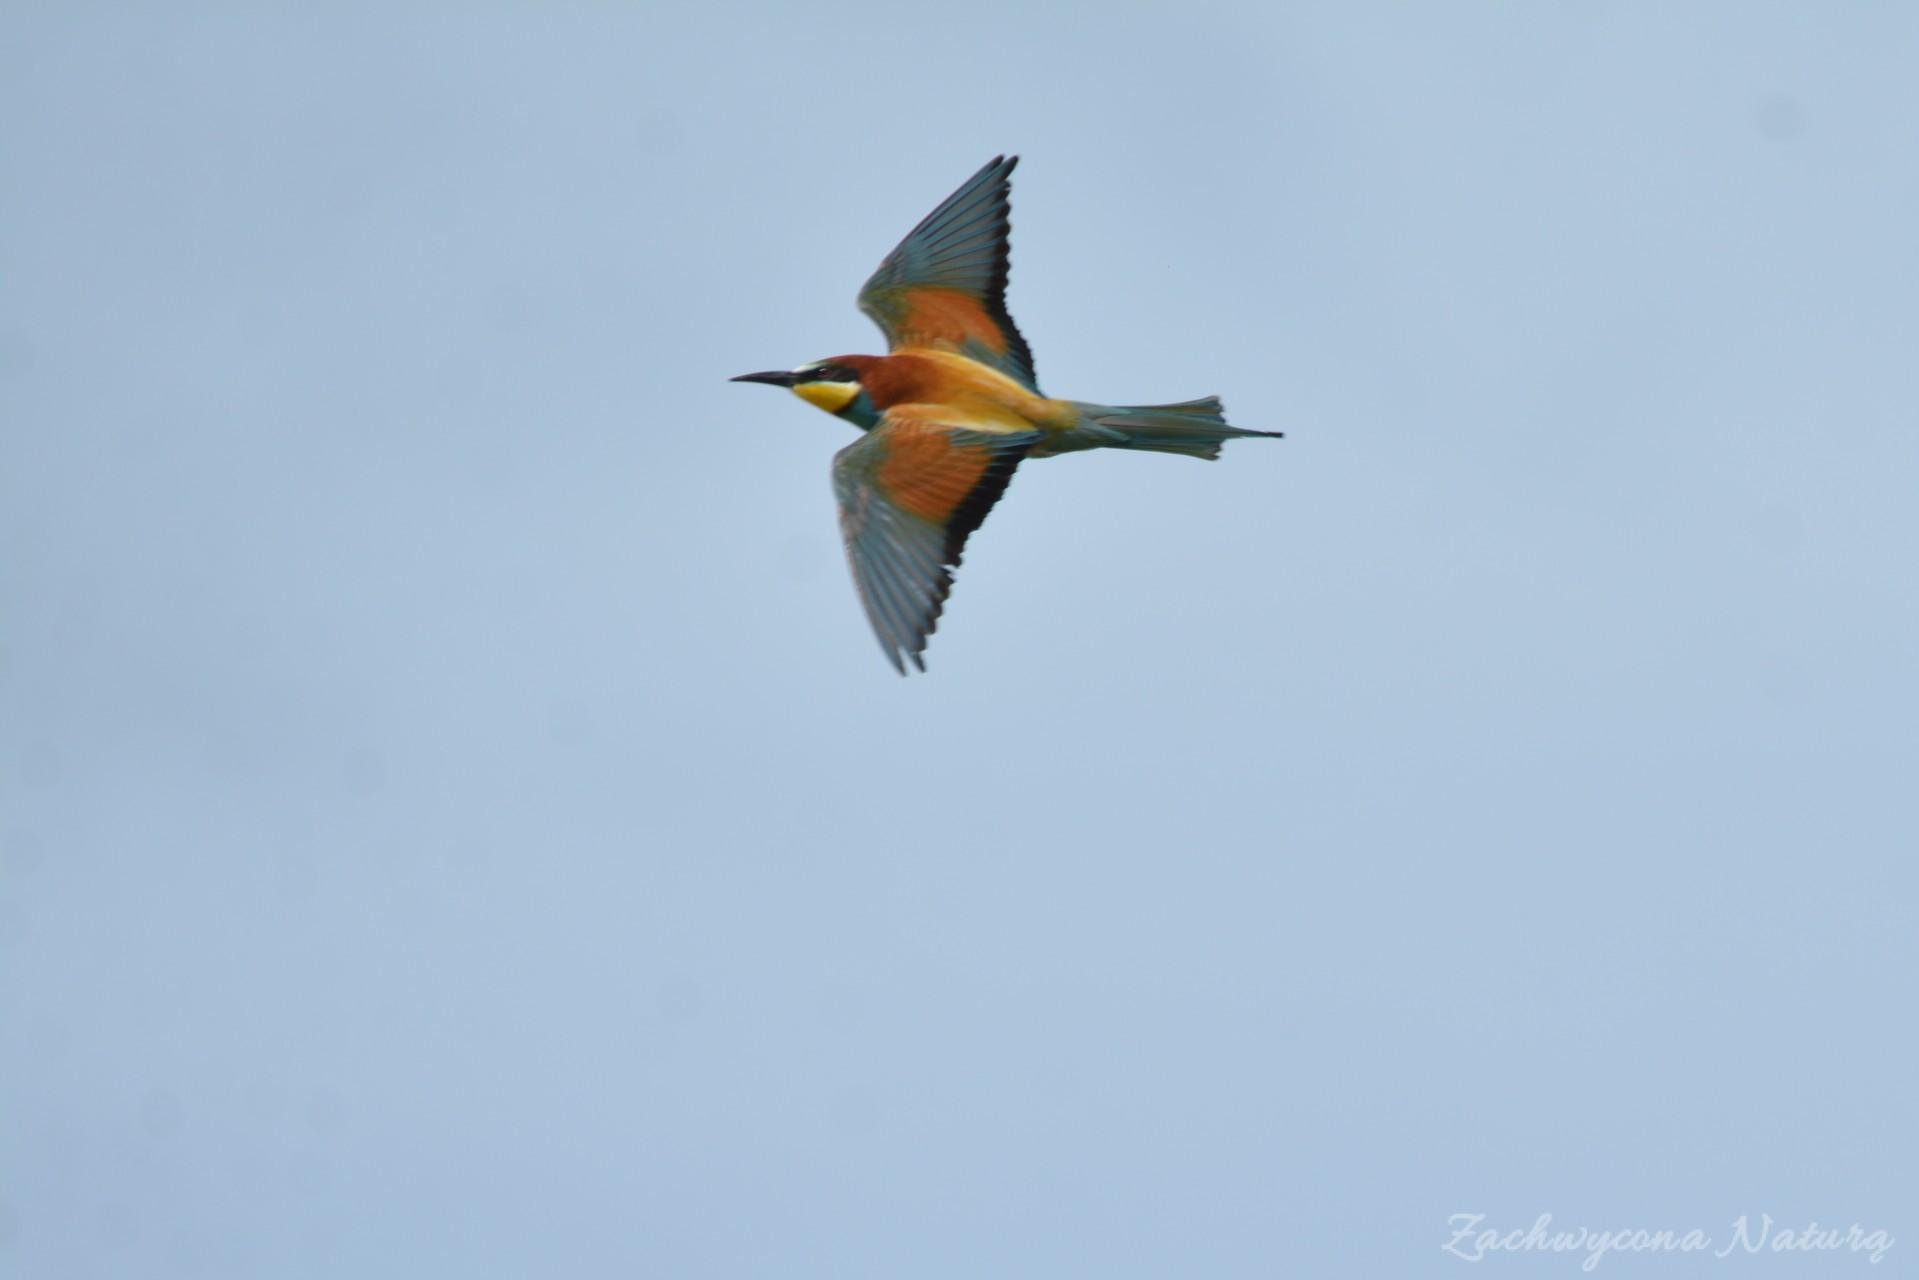 zolna-kolorowa-jak-papuga-merops-apiaster-bee-eater-4